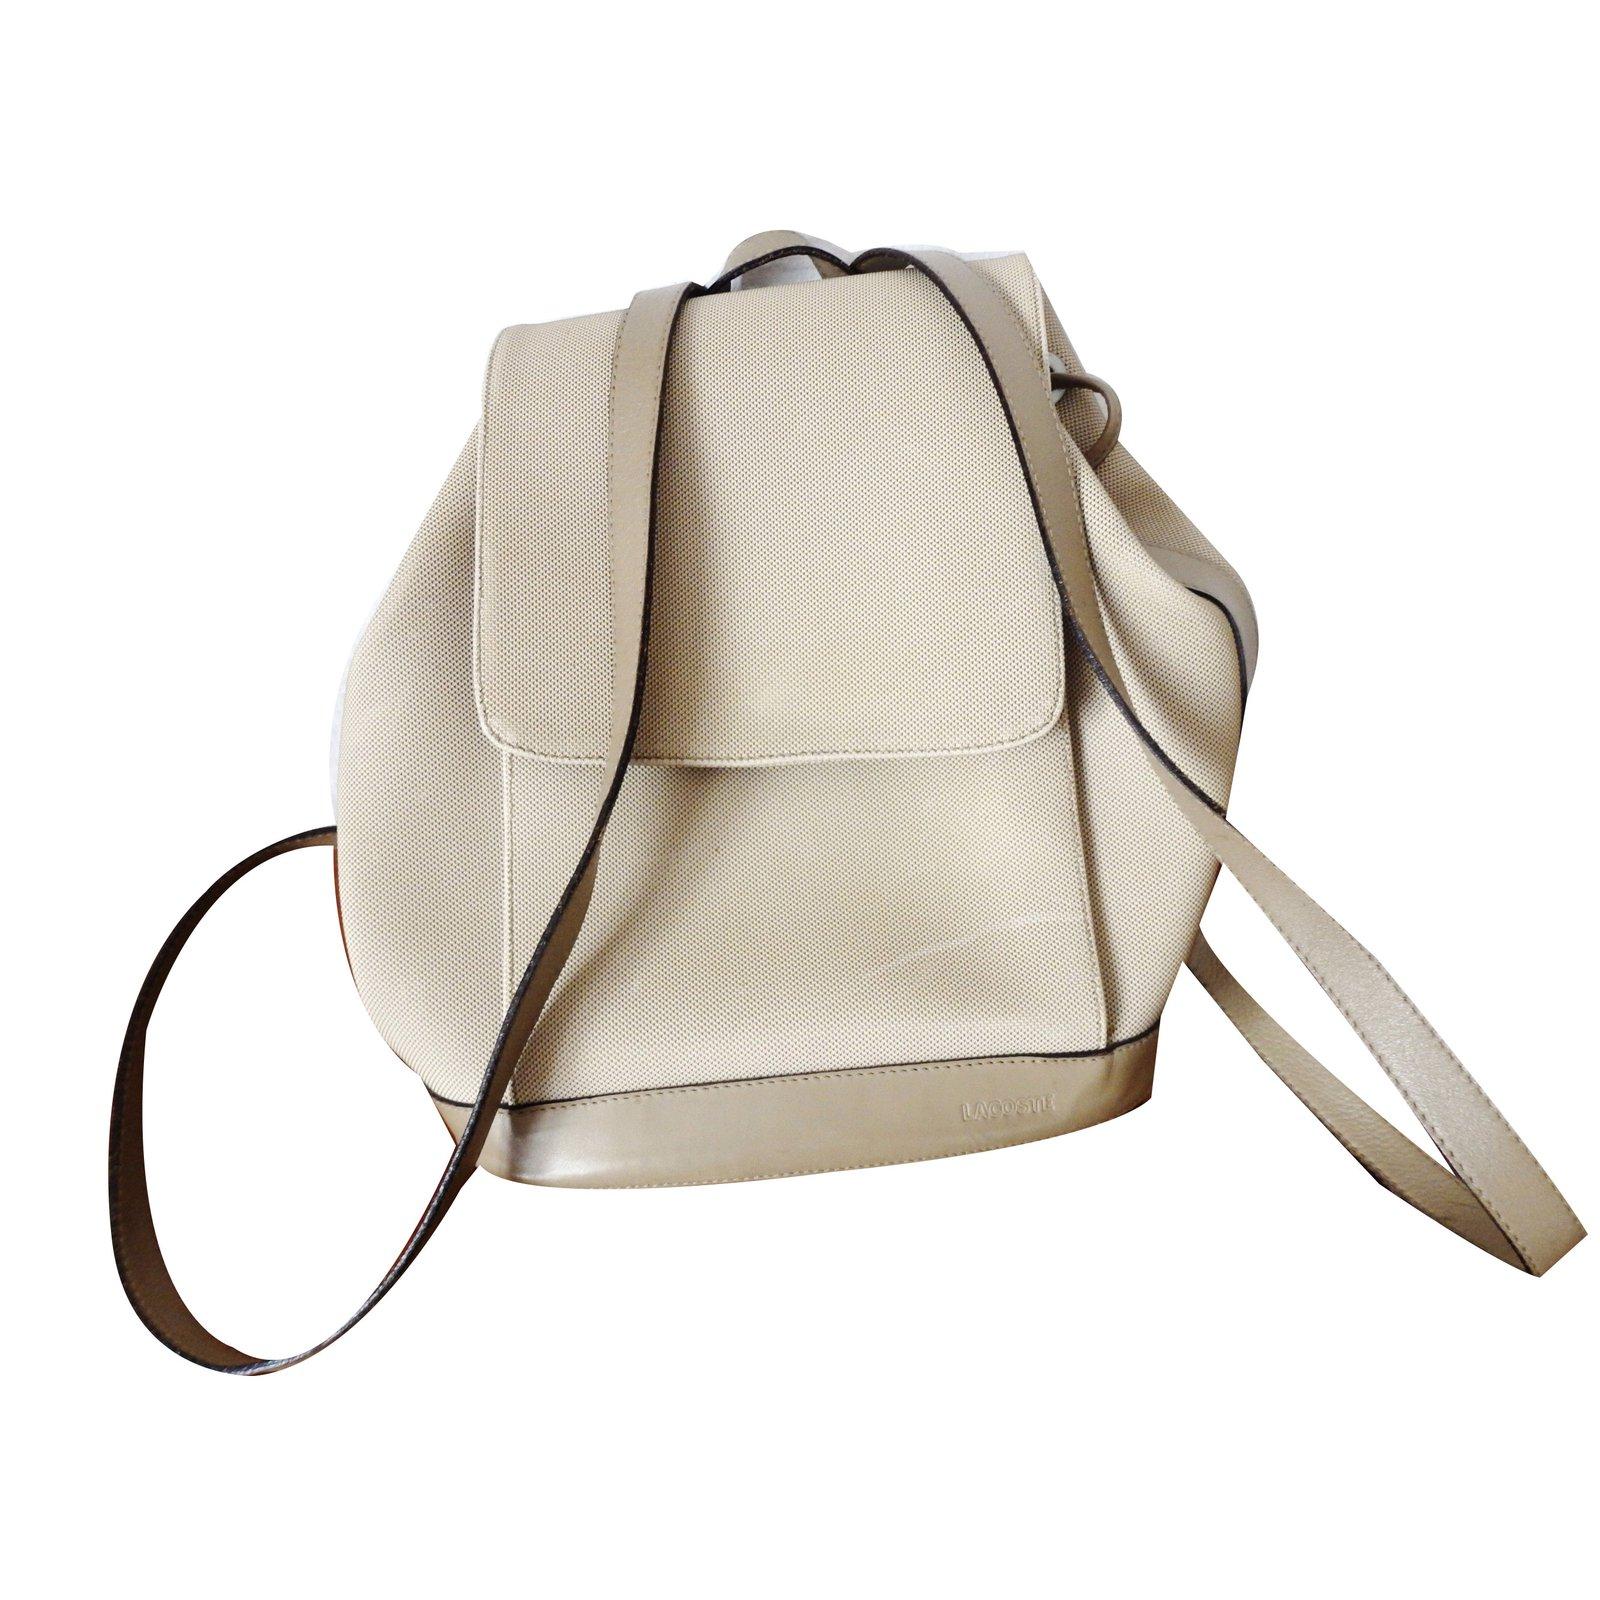 sacs dos lacoste sac dos toile et cuir toile beige ref. Black Bedroom Furniture Sets. Home Design Ideas